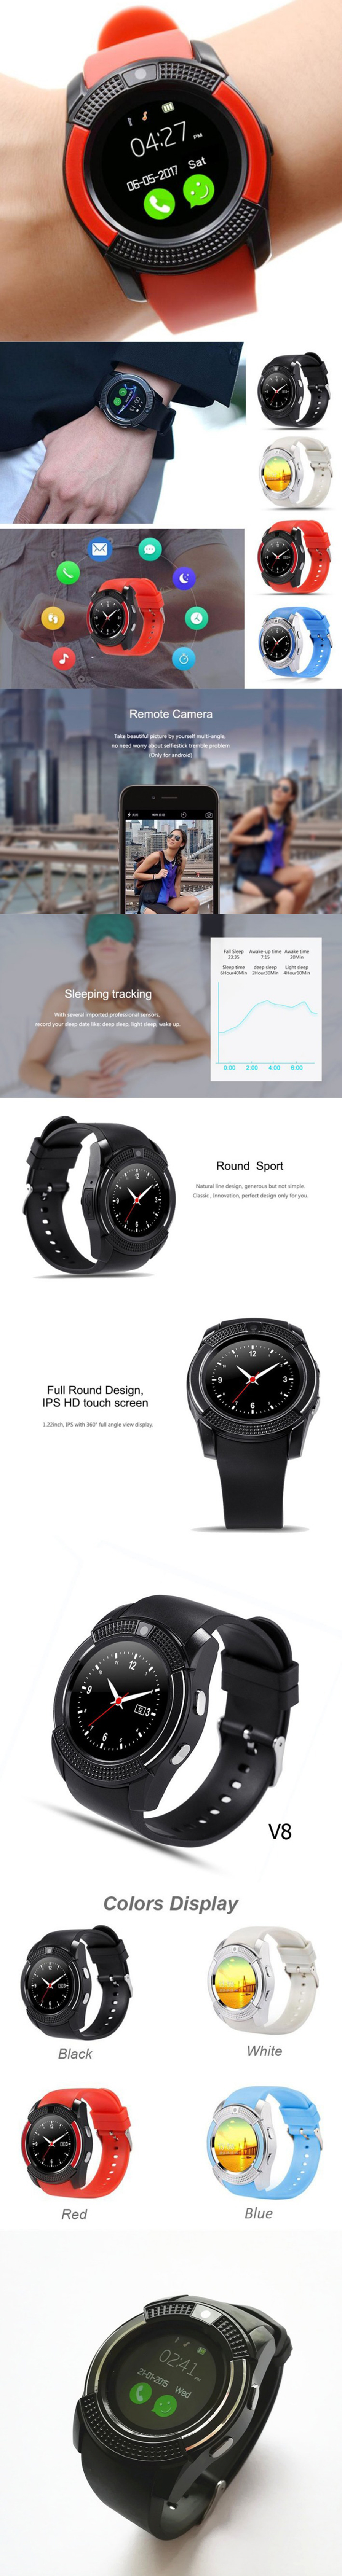 V8 Smart Watch Barcelet Full HD IPS Waterproof Wristband Bluetooth Black